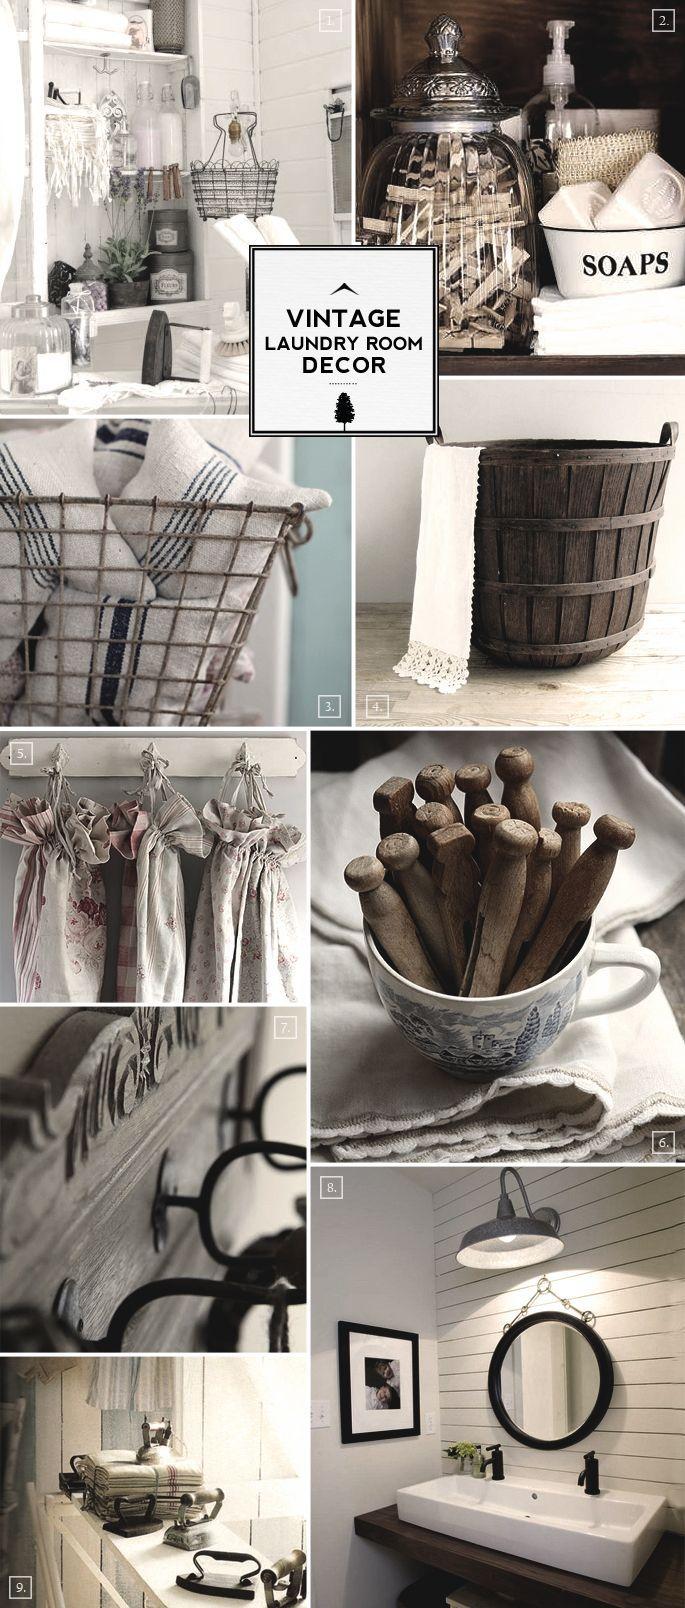 Style Guide Vintage Laundry Room Decor Ideas Vaskerum